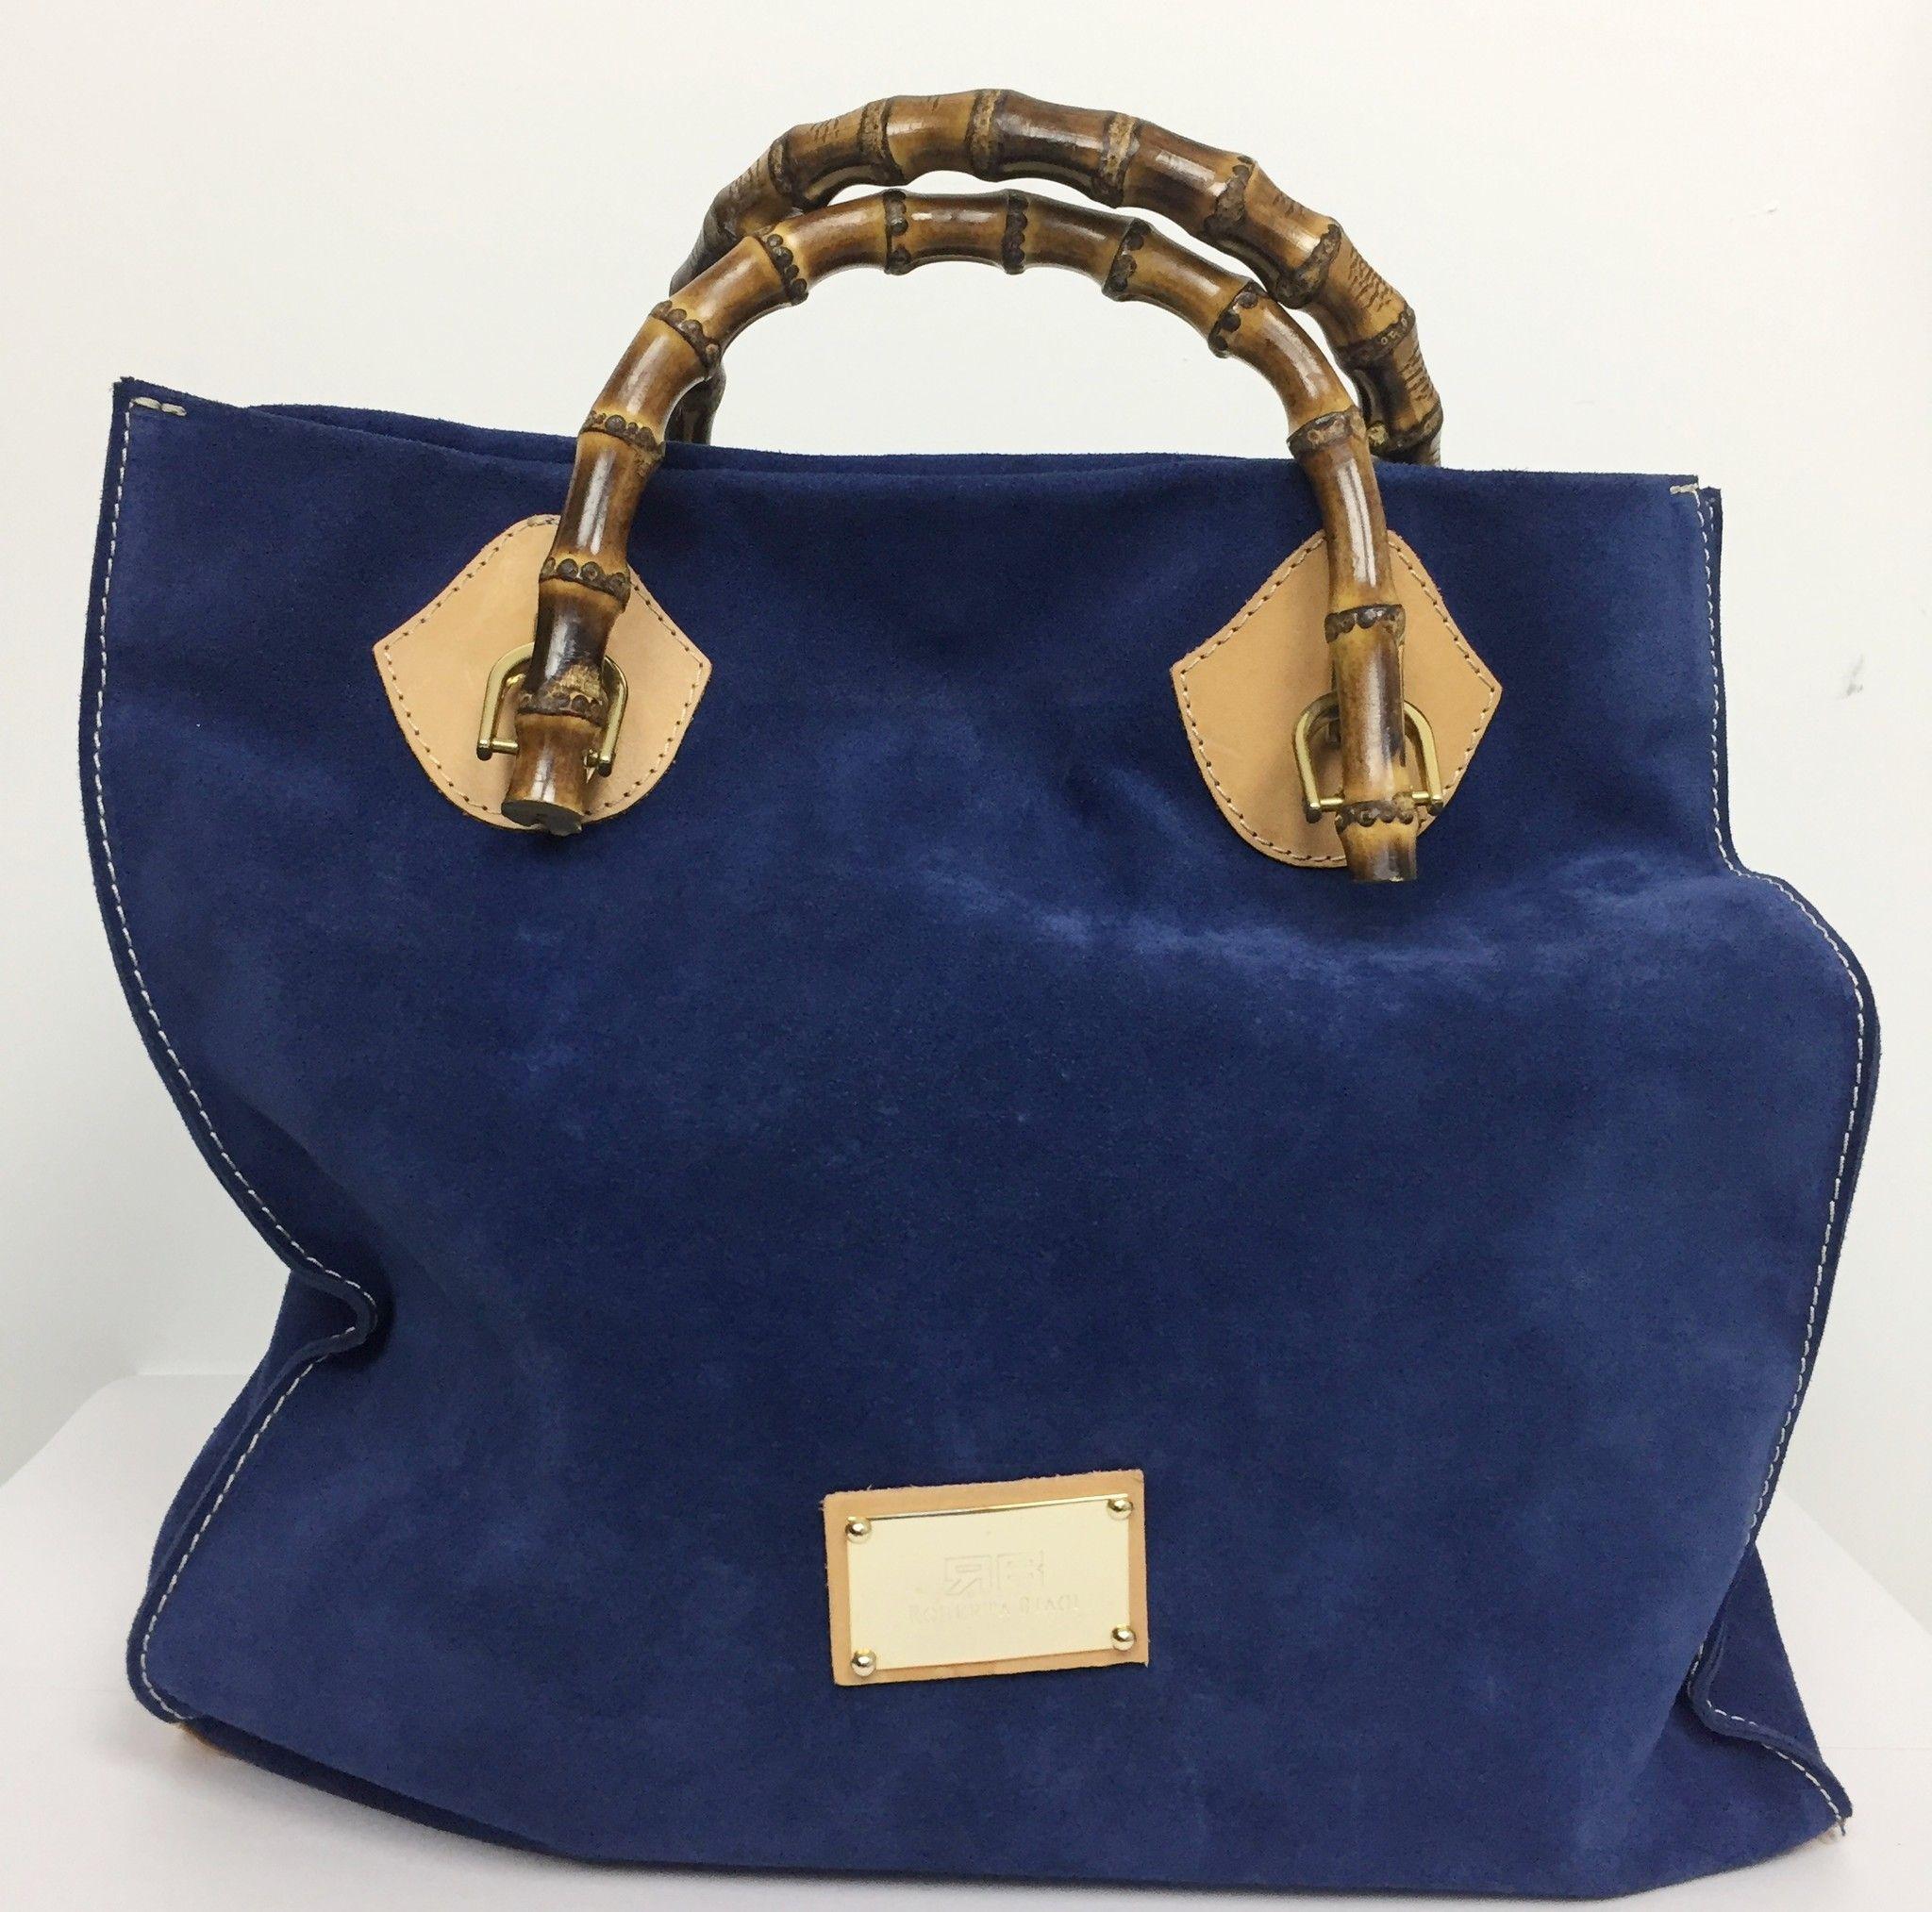 Roberta Biagi Suede Leather Bag Cod.03158